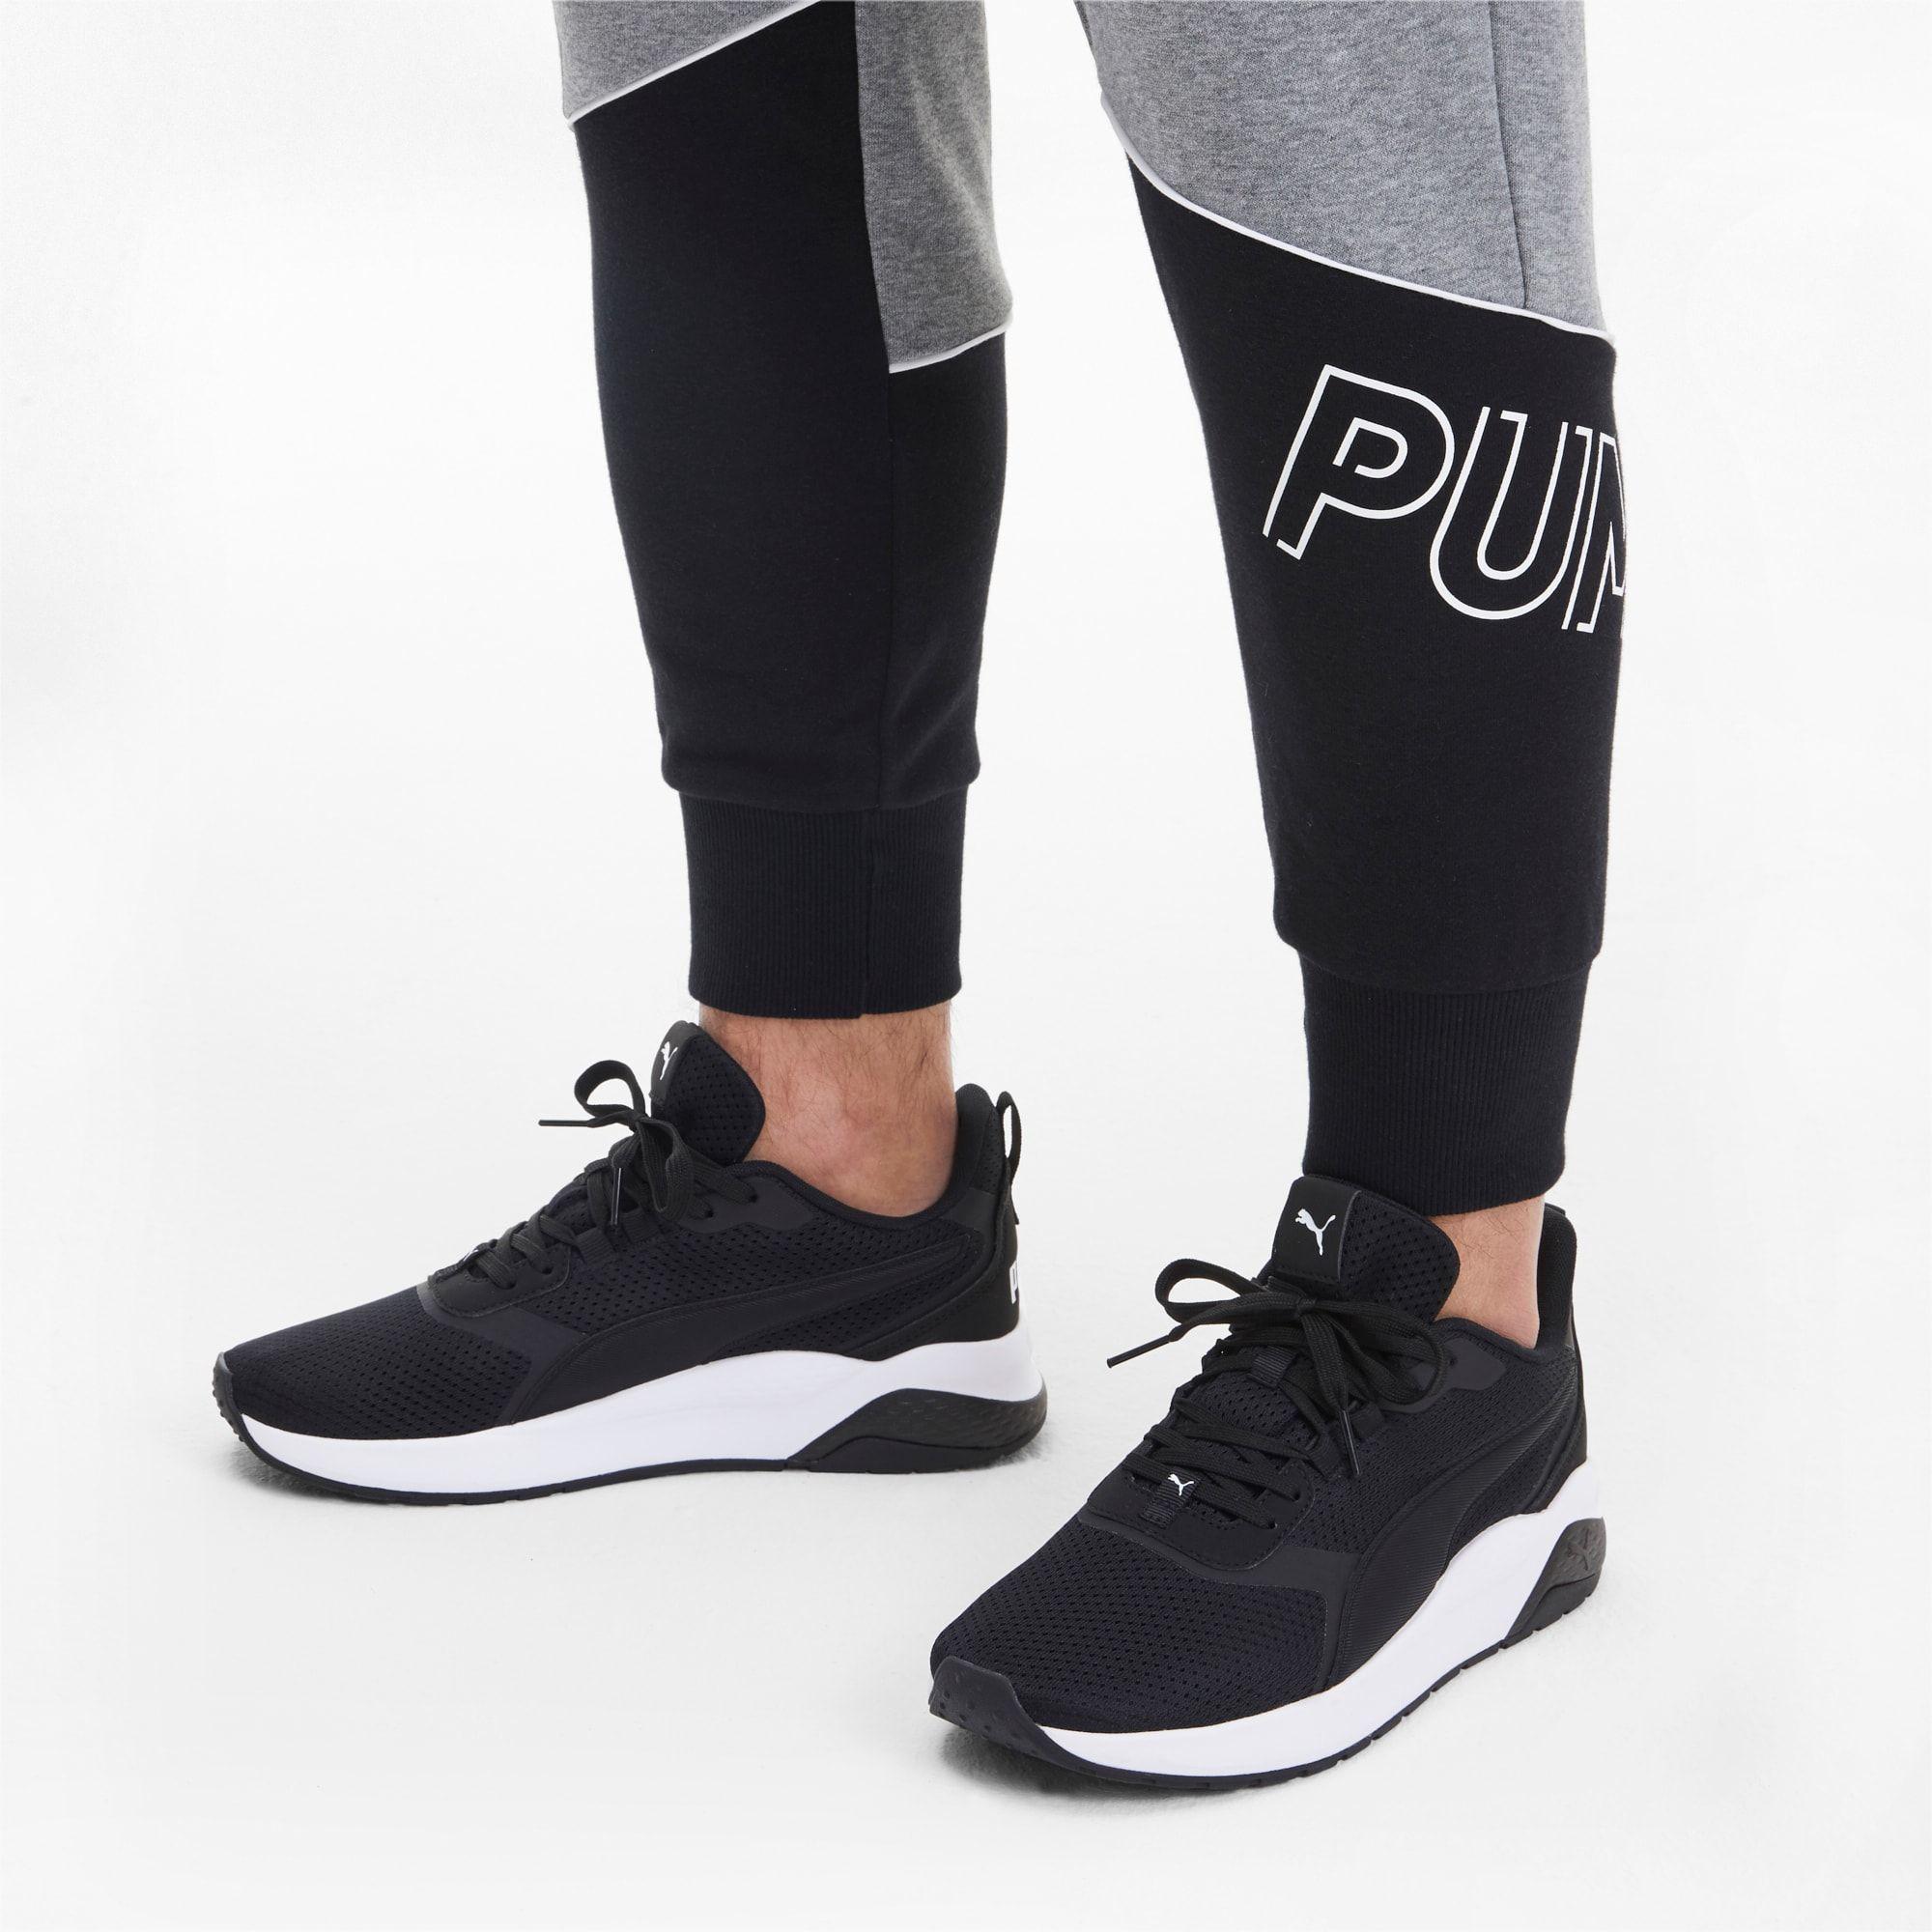 Anzarun FS Trainers | PUMA Shoes | PUMA Germany in 2021 | Trainers ...